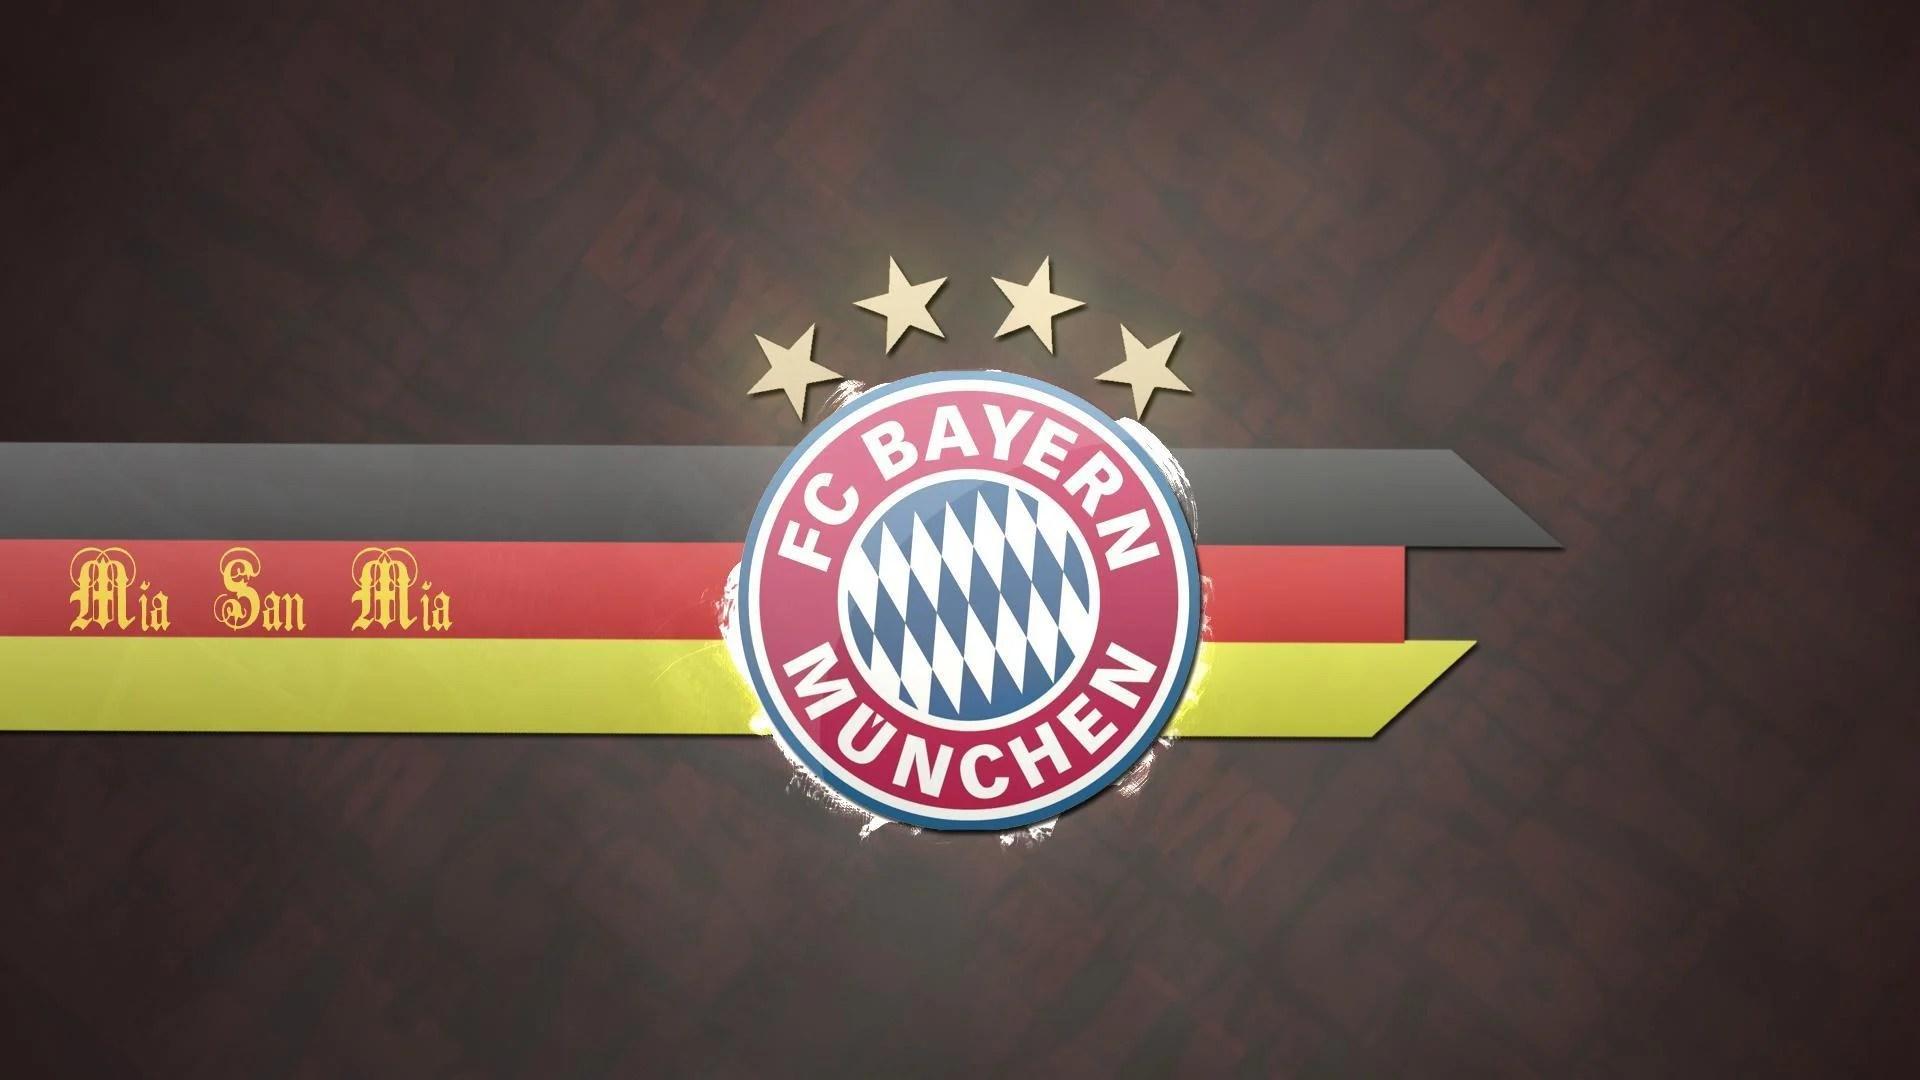 Fc Bayern Munich HD Wallpapers - Wallpaper Cave